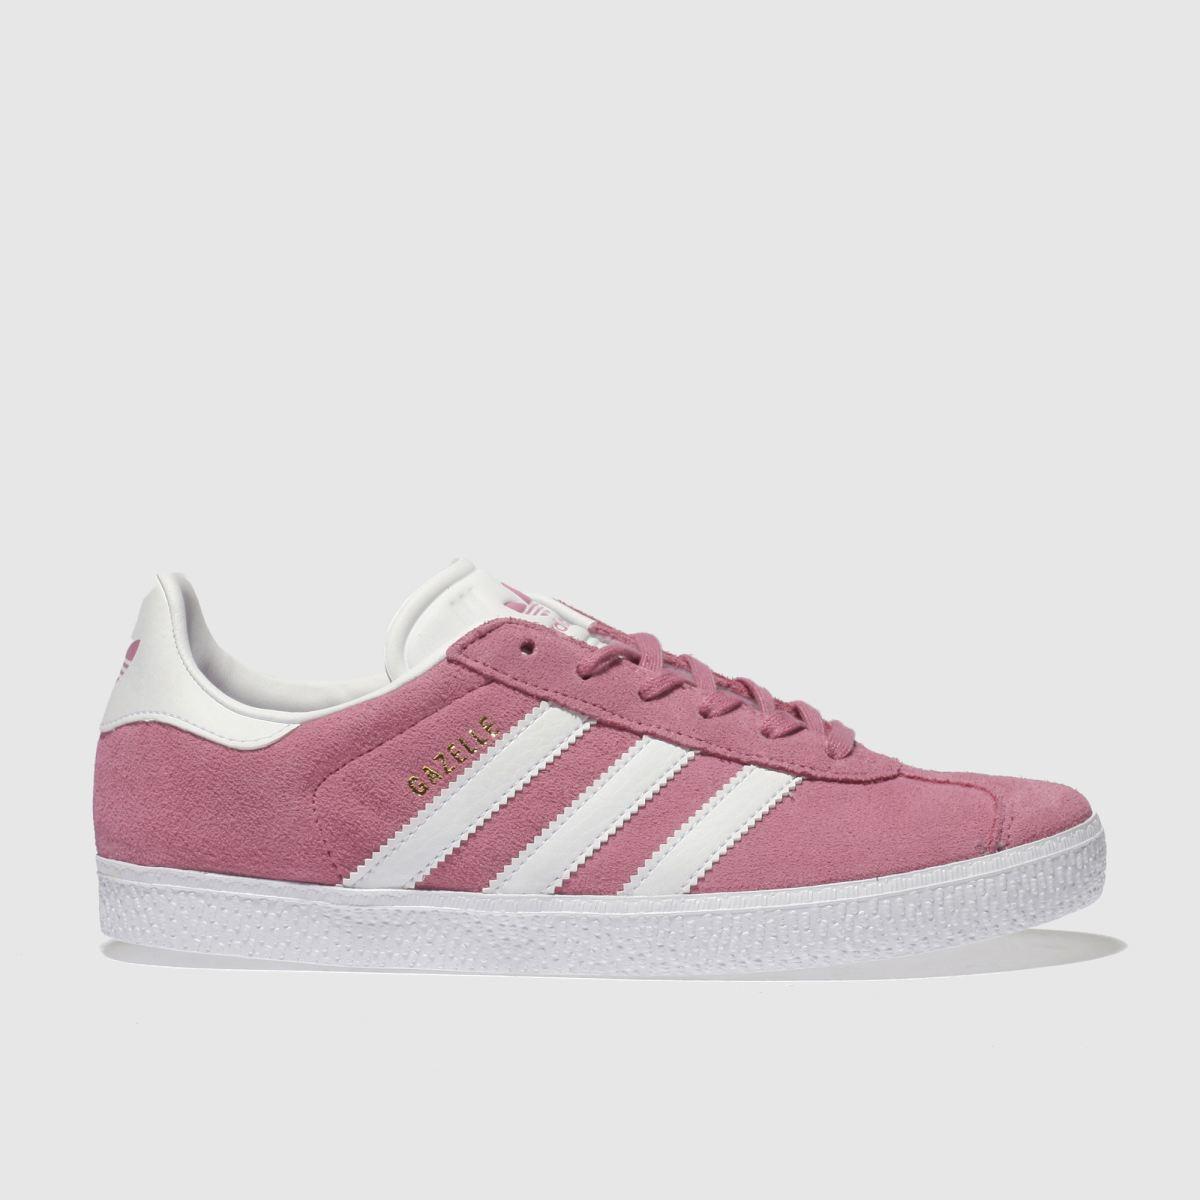 Adidas Pink Gazelle Girls Youth Youth